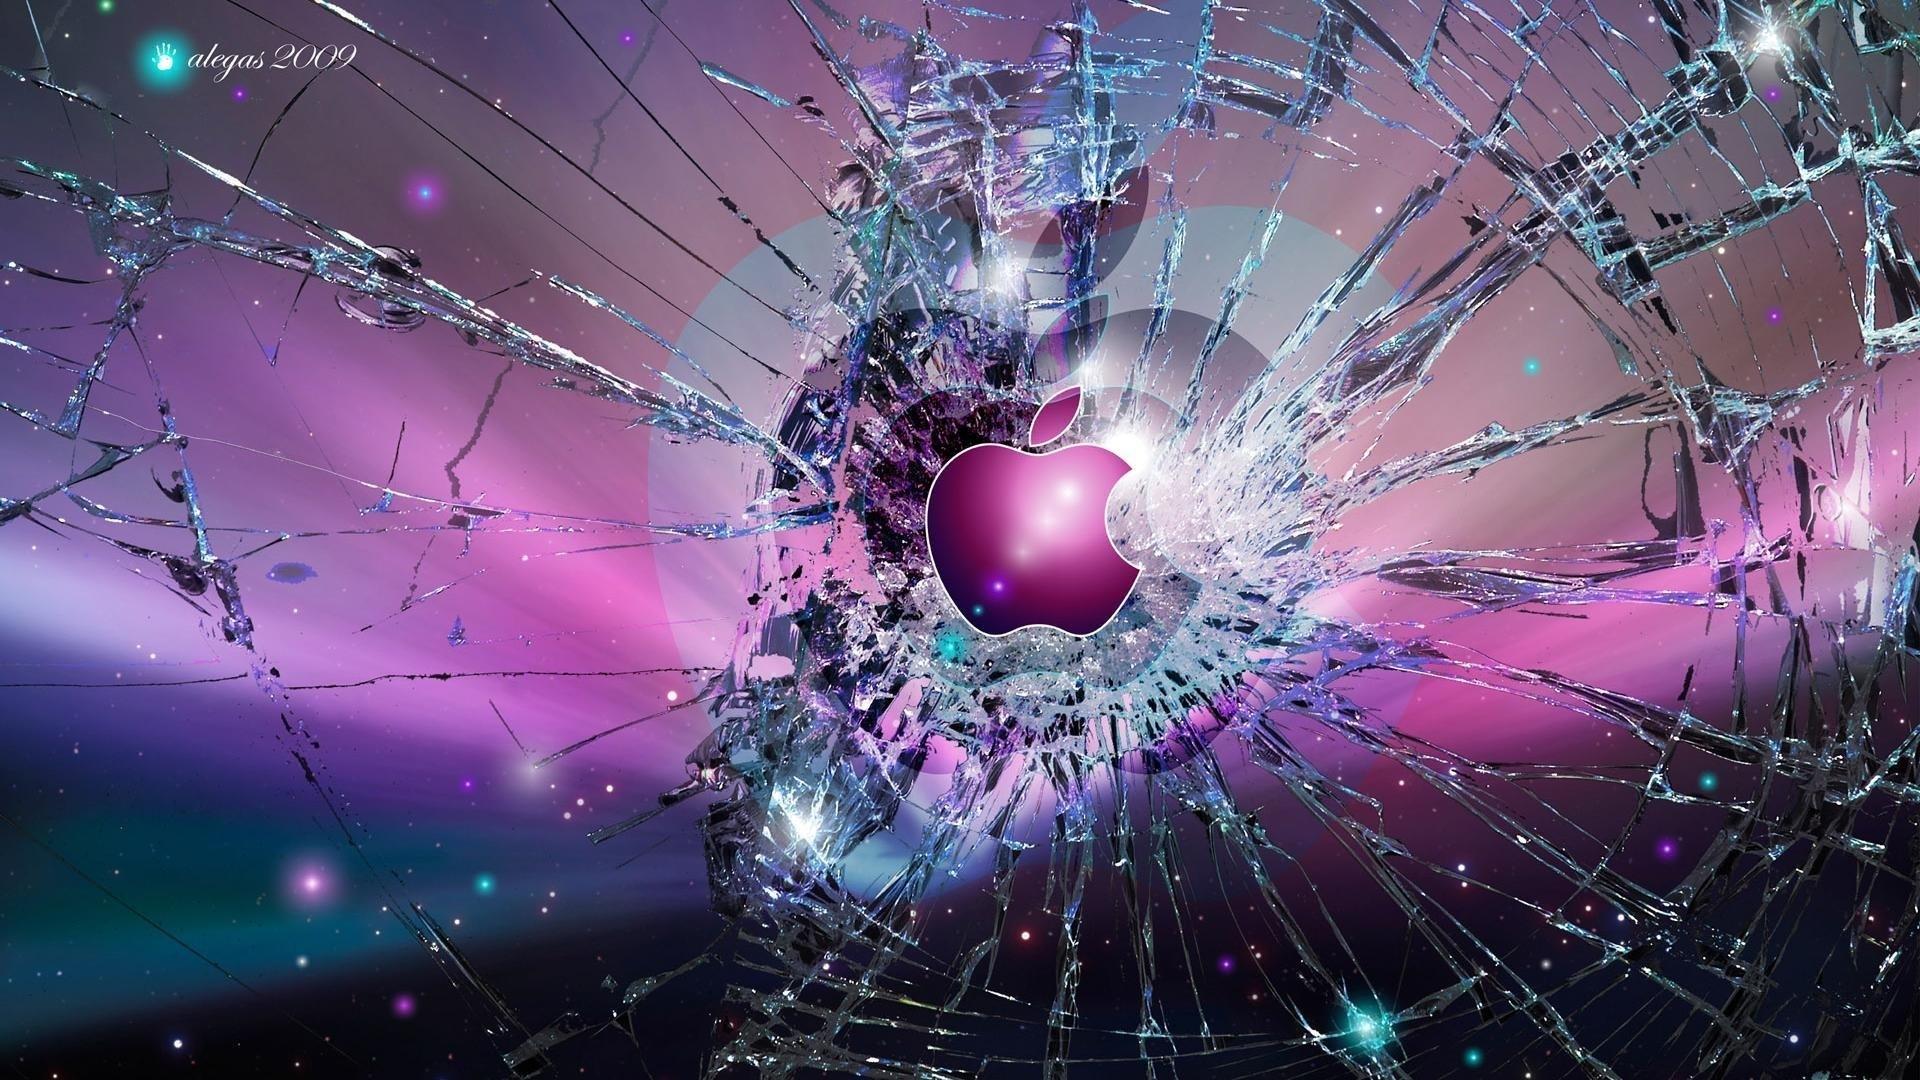 Apple-HD-Apple-Logo-Desktop-Backgrounds-Page-wallpaper-wp360166